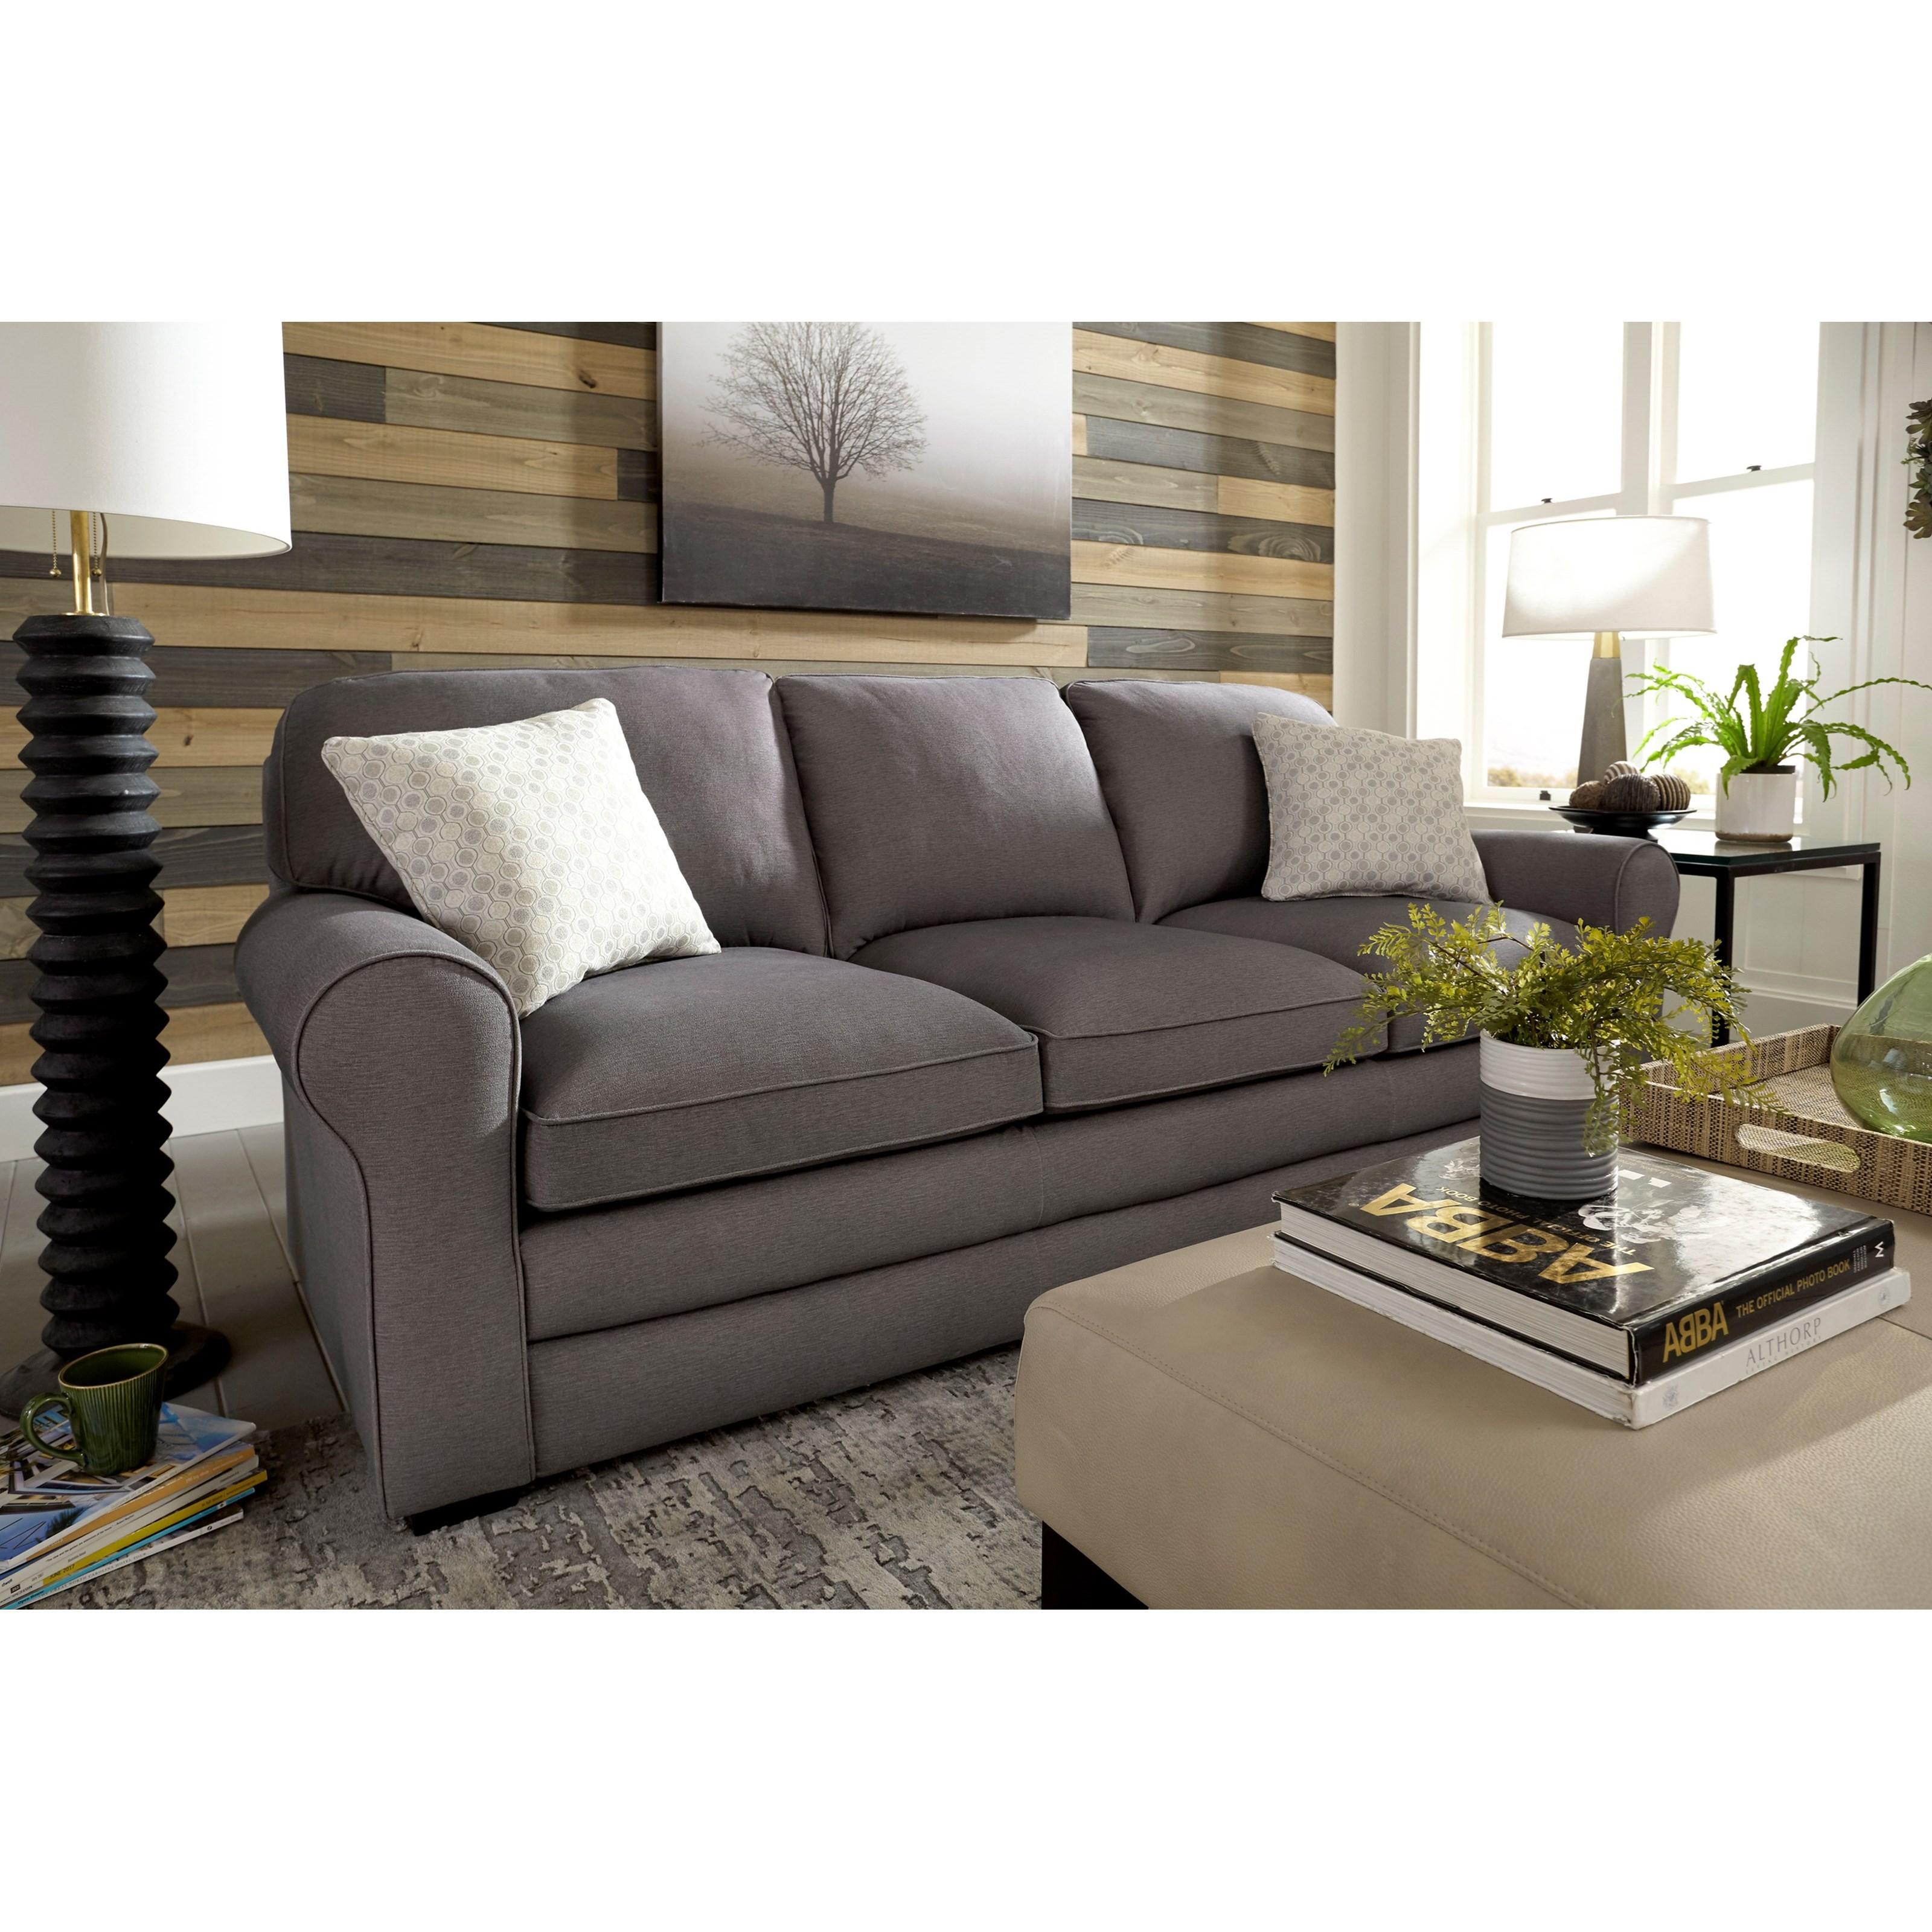 Best Home Furnishings Nicodemus Casual Sofa With Large